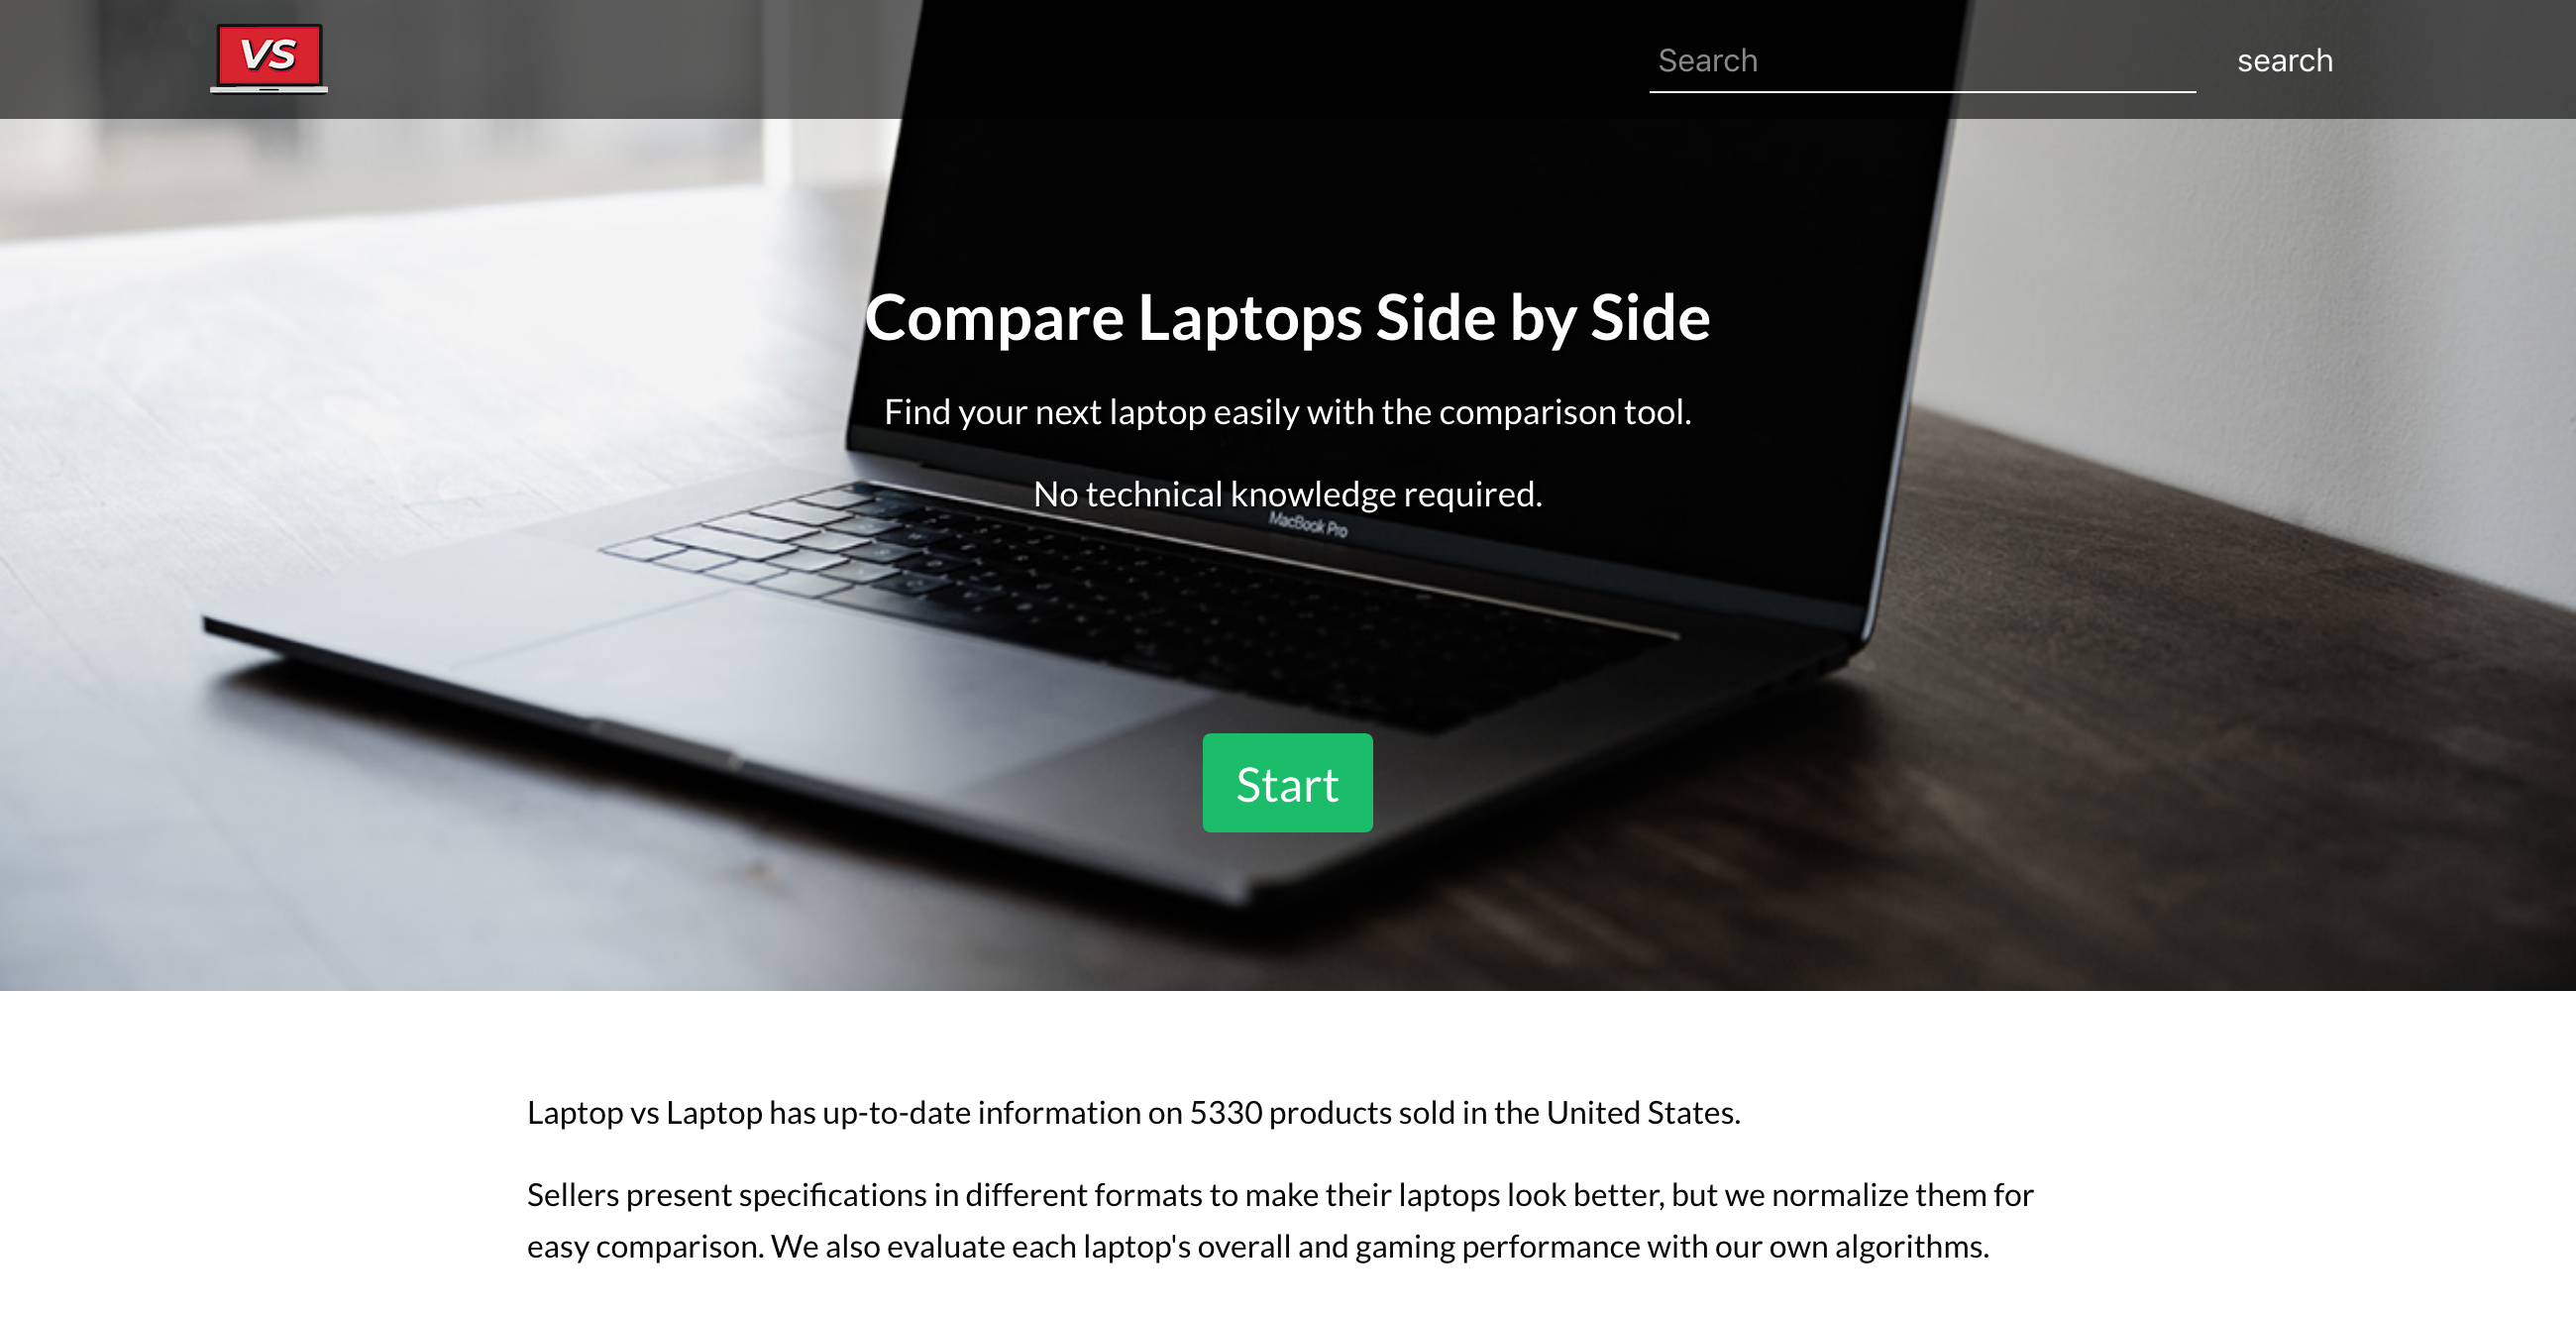 laptopvslaptop.com